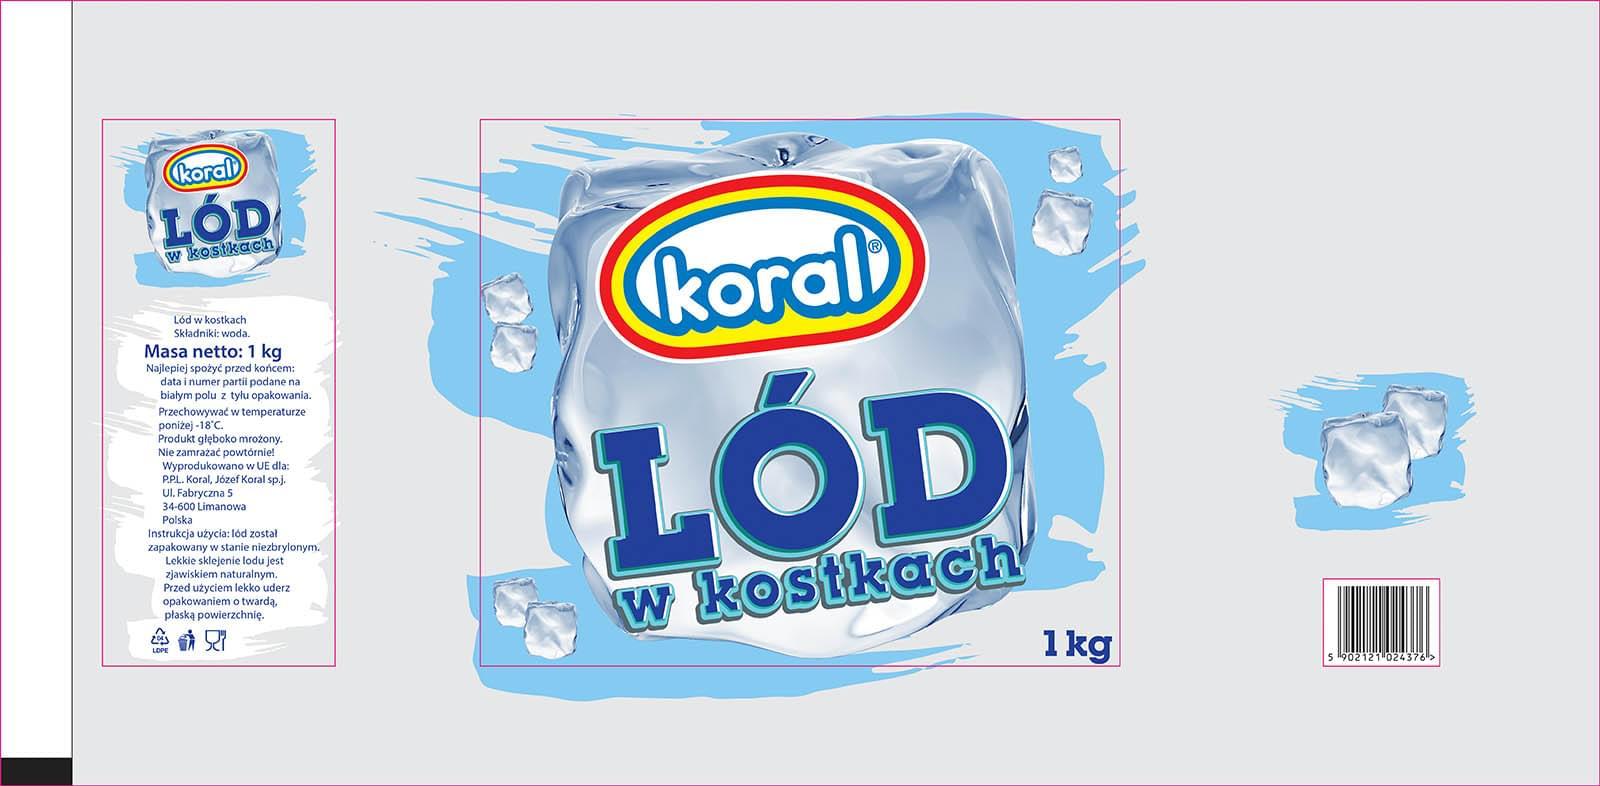 KORAL_LOD_w_kostkach_2017.min